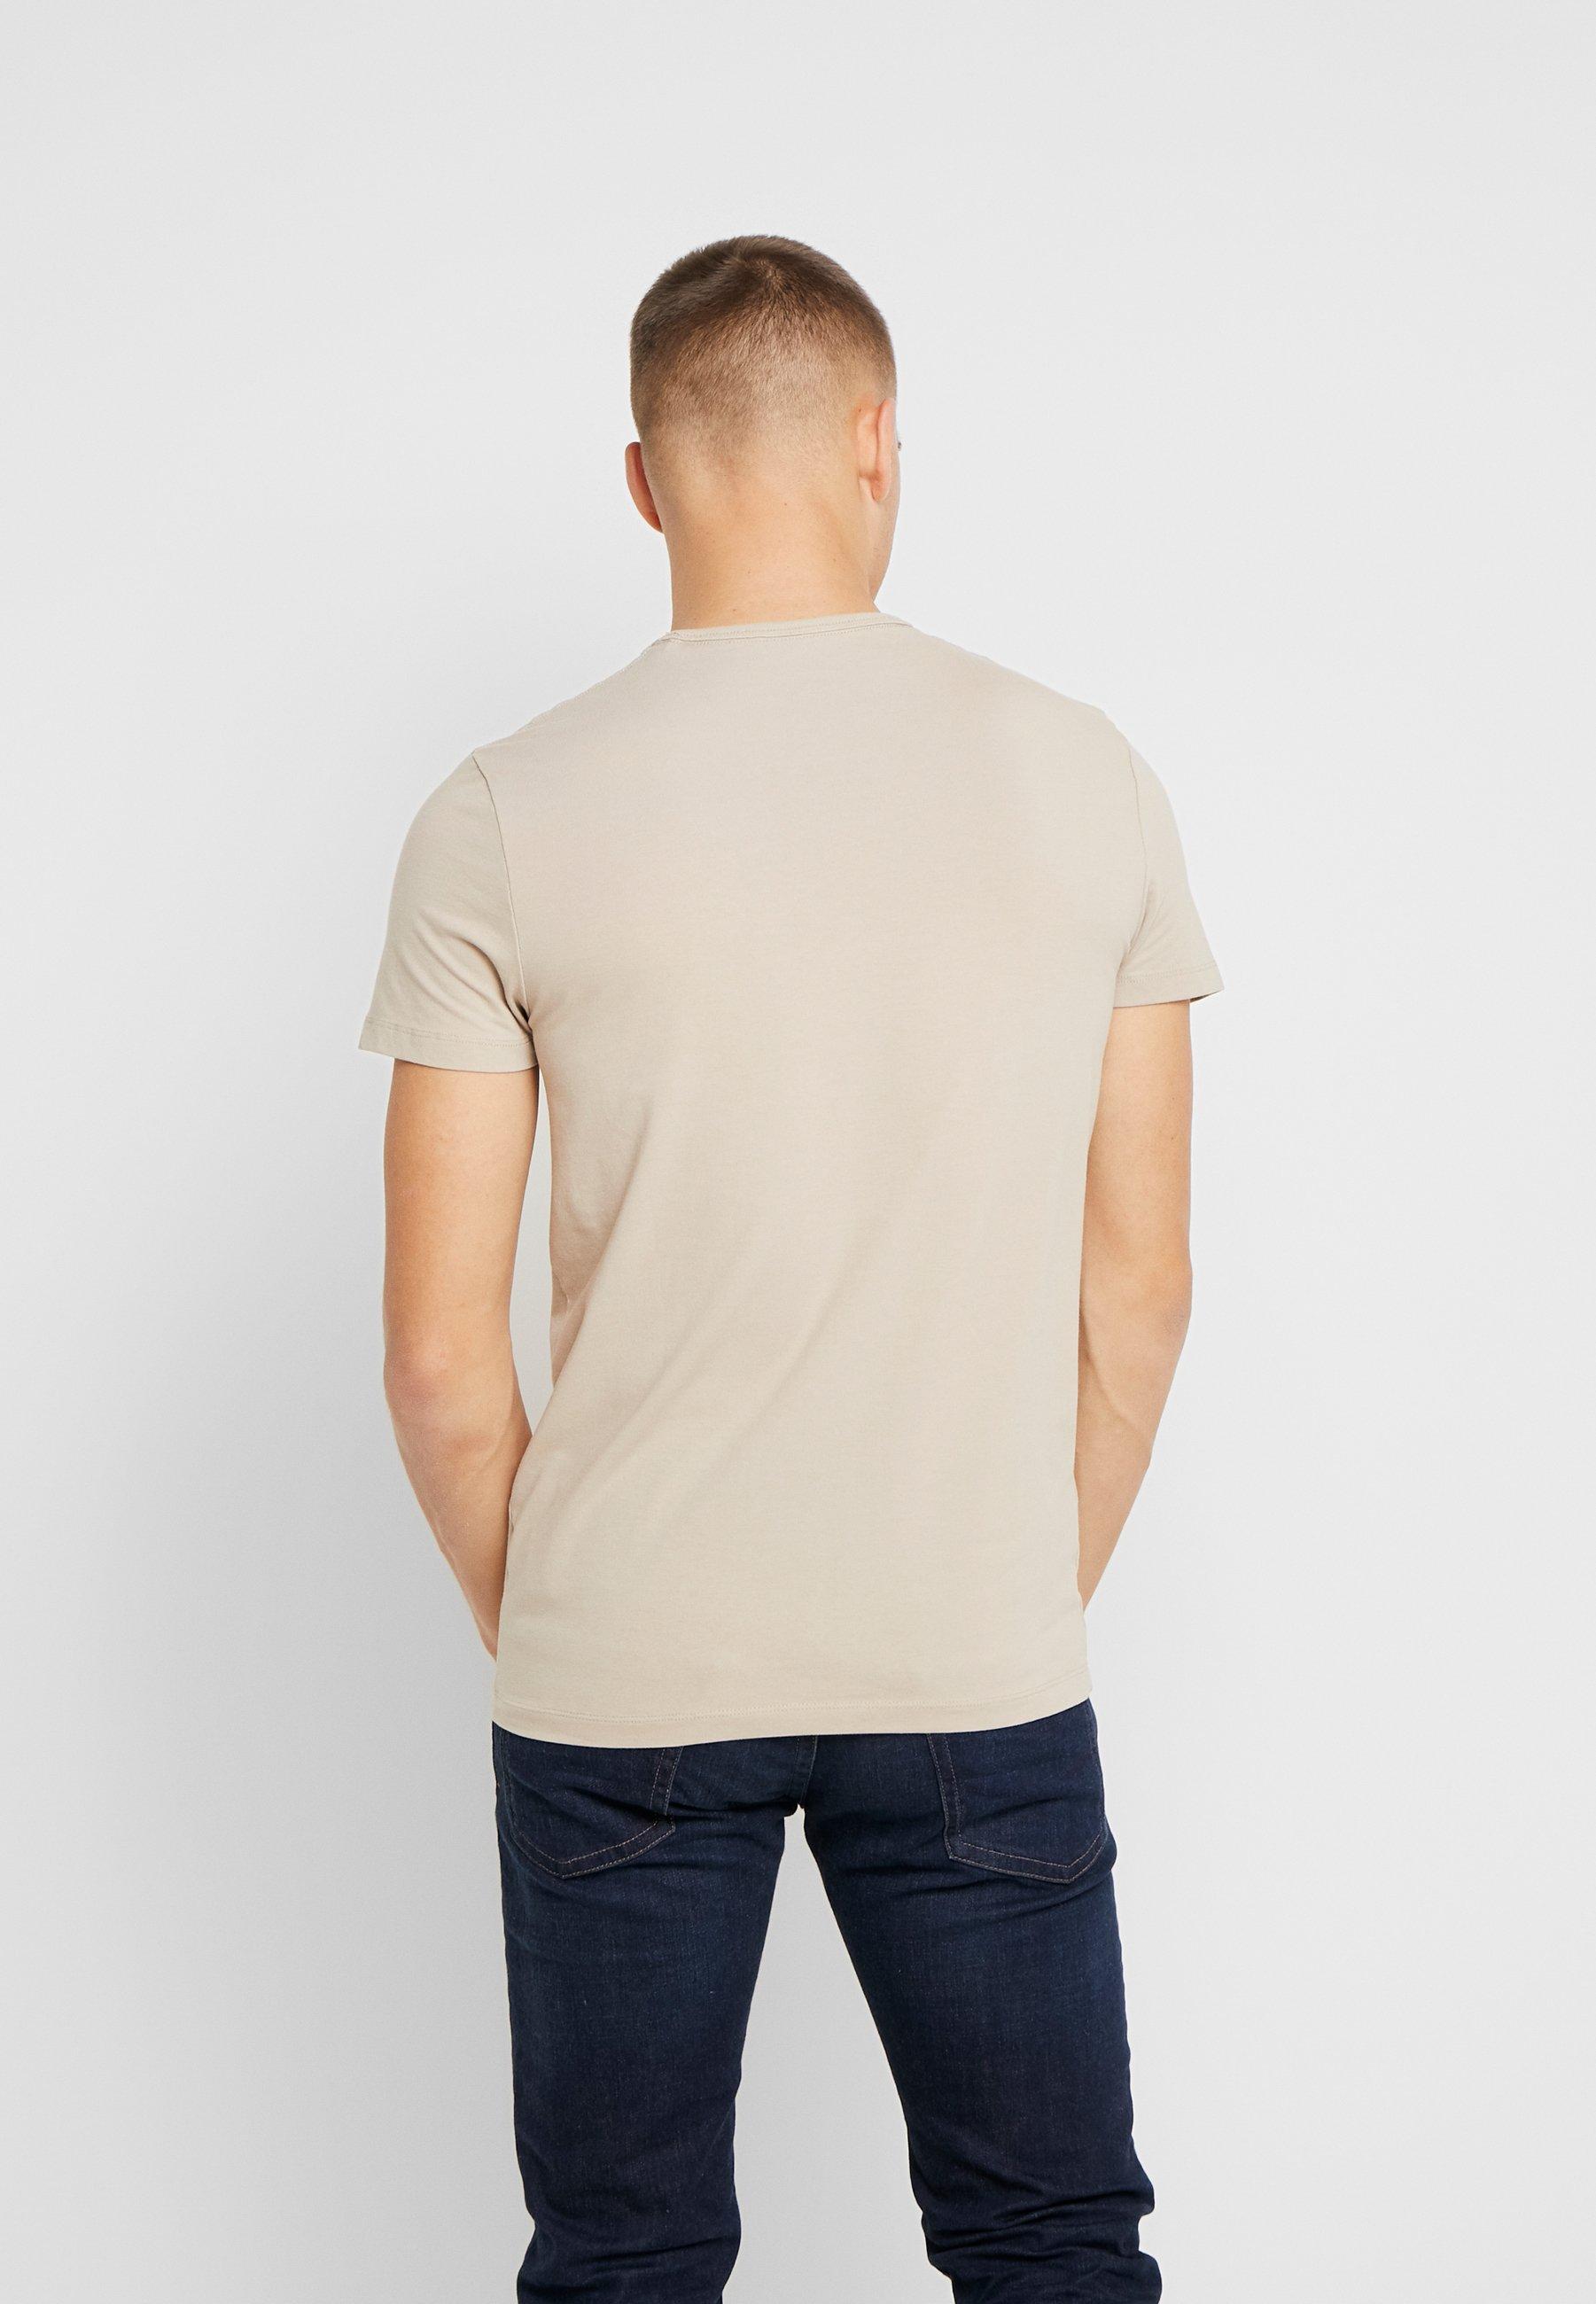 Original Pepe shirt Jeans Hume BasicT bfYIv76yg